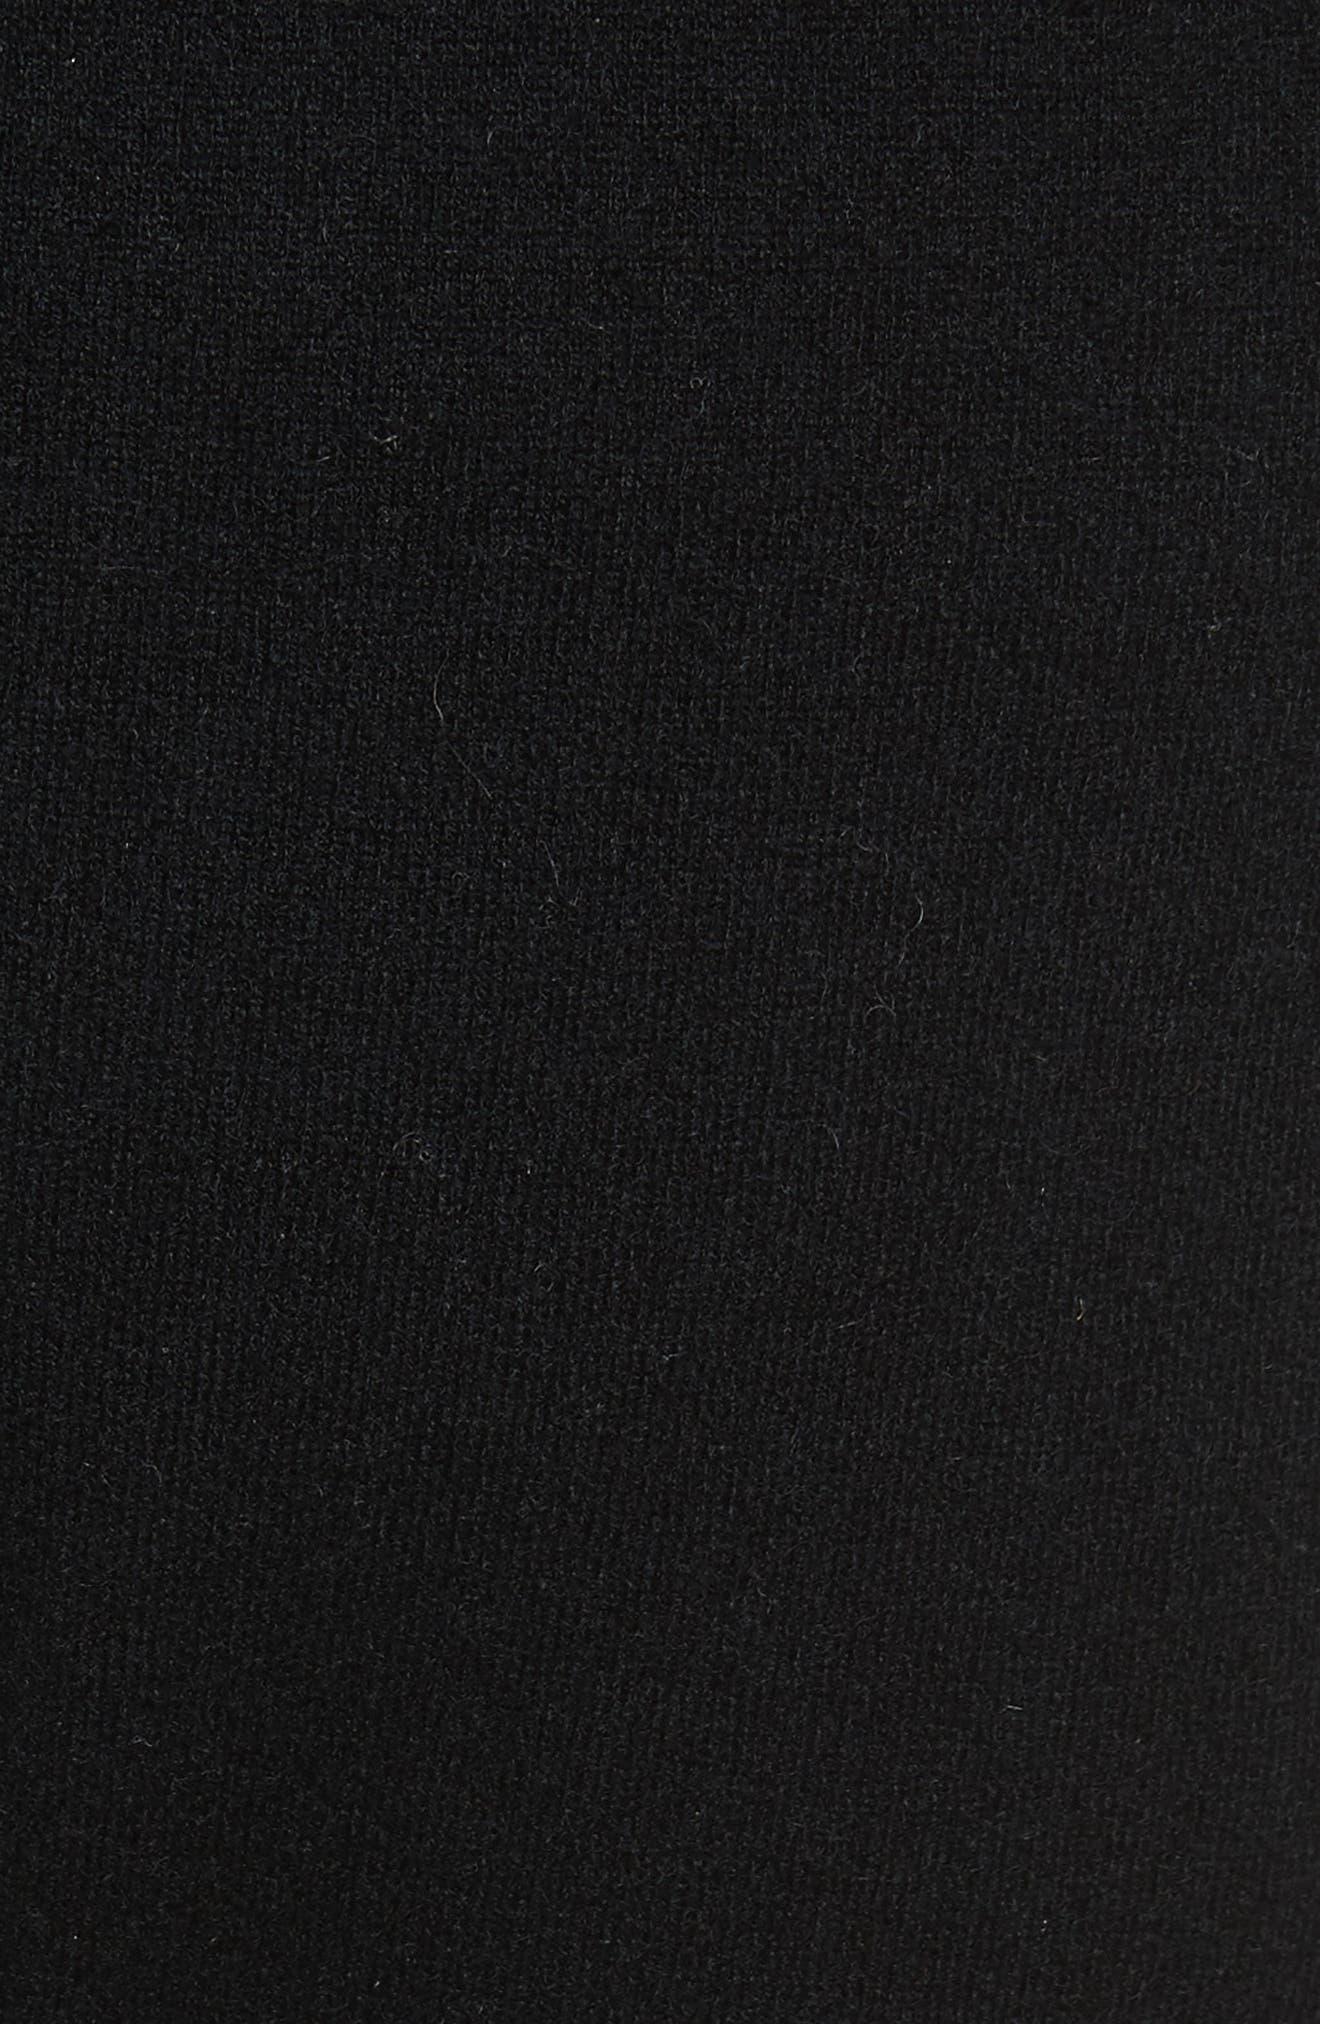 Wool & Cashmere Blend Jogger Pants,                             Alternate thumbnail 5, color,                             Black